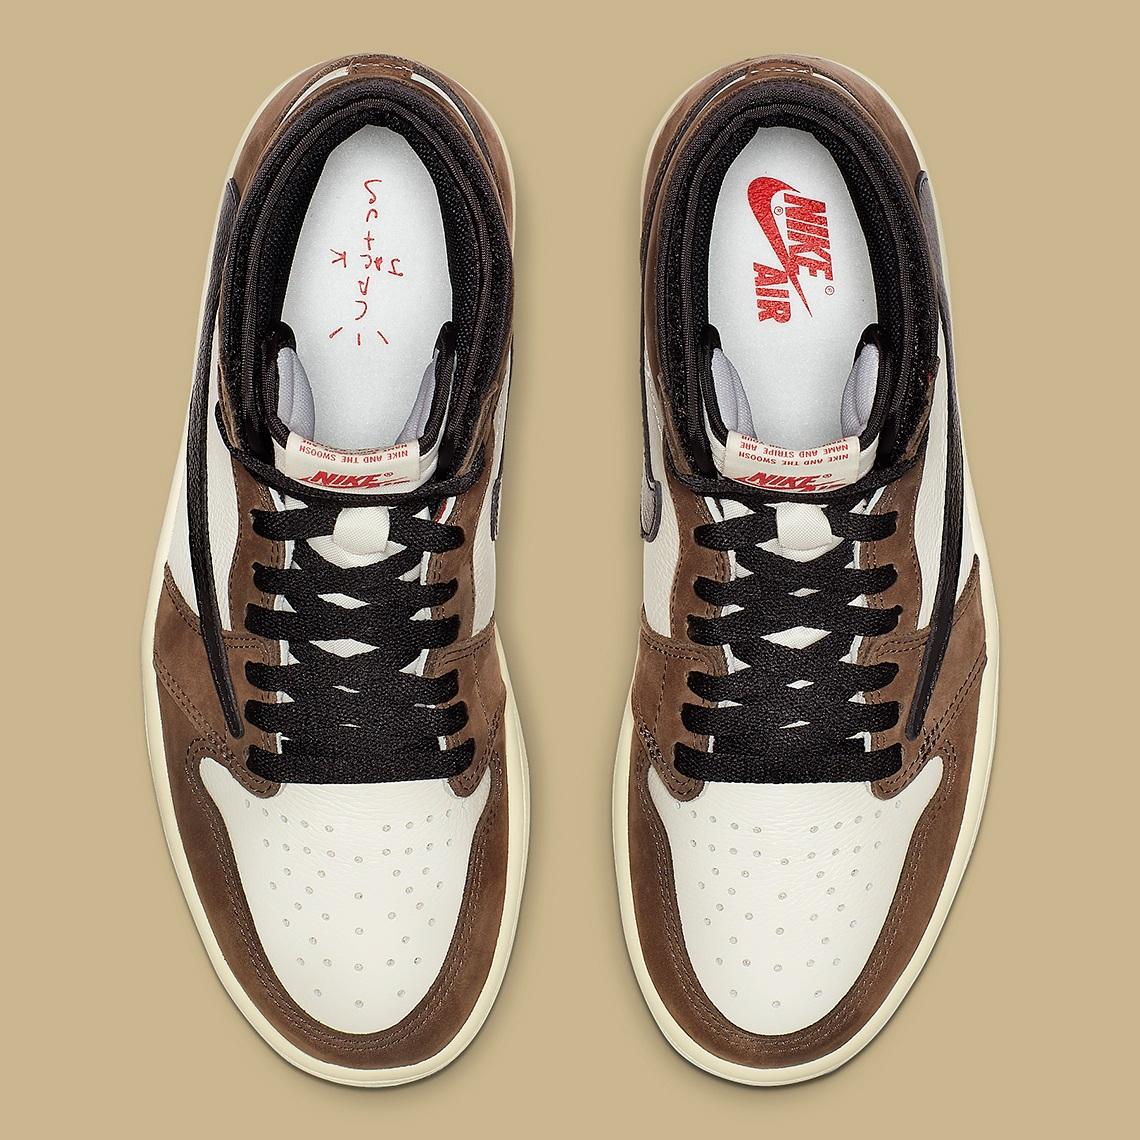 good texture buying cheap authorized site Nike x Travis Scott Air Jordan 1 Cactus Jack